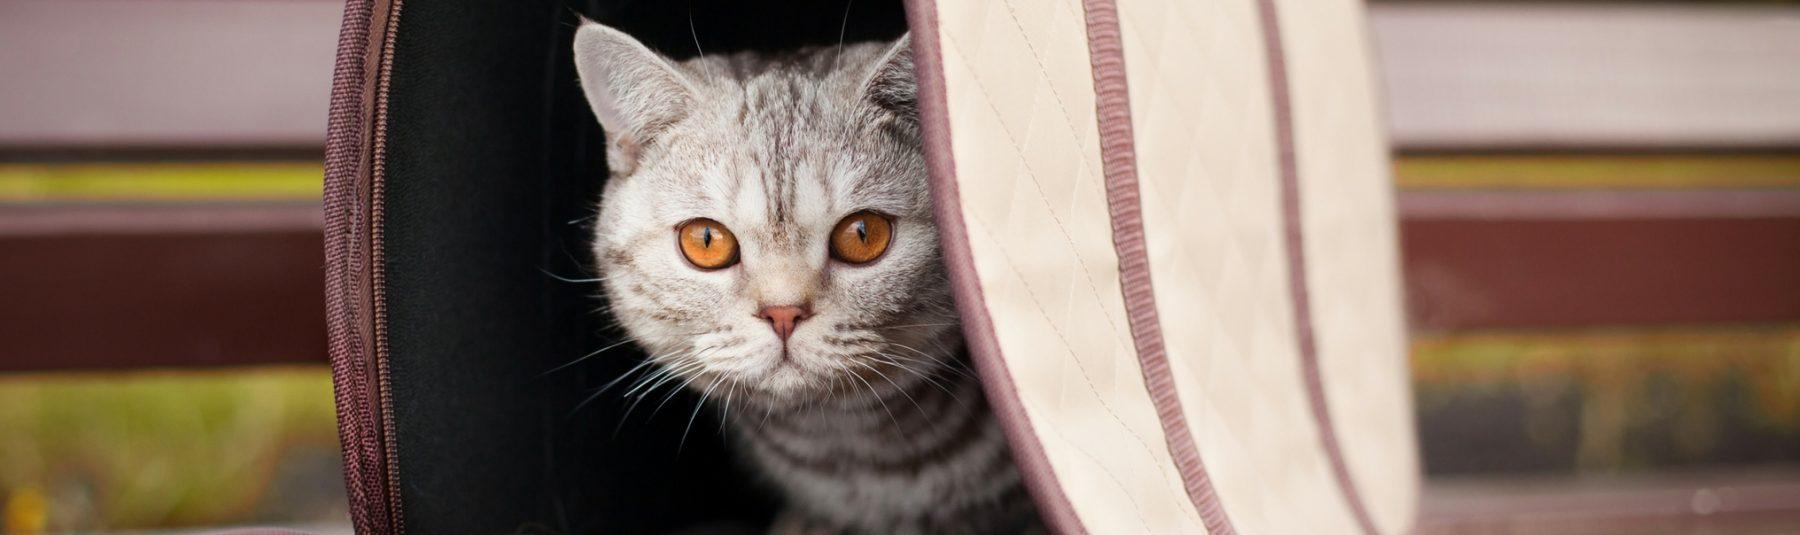 cat in cat house